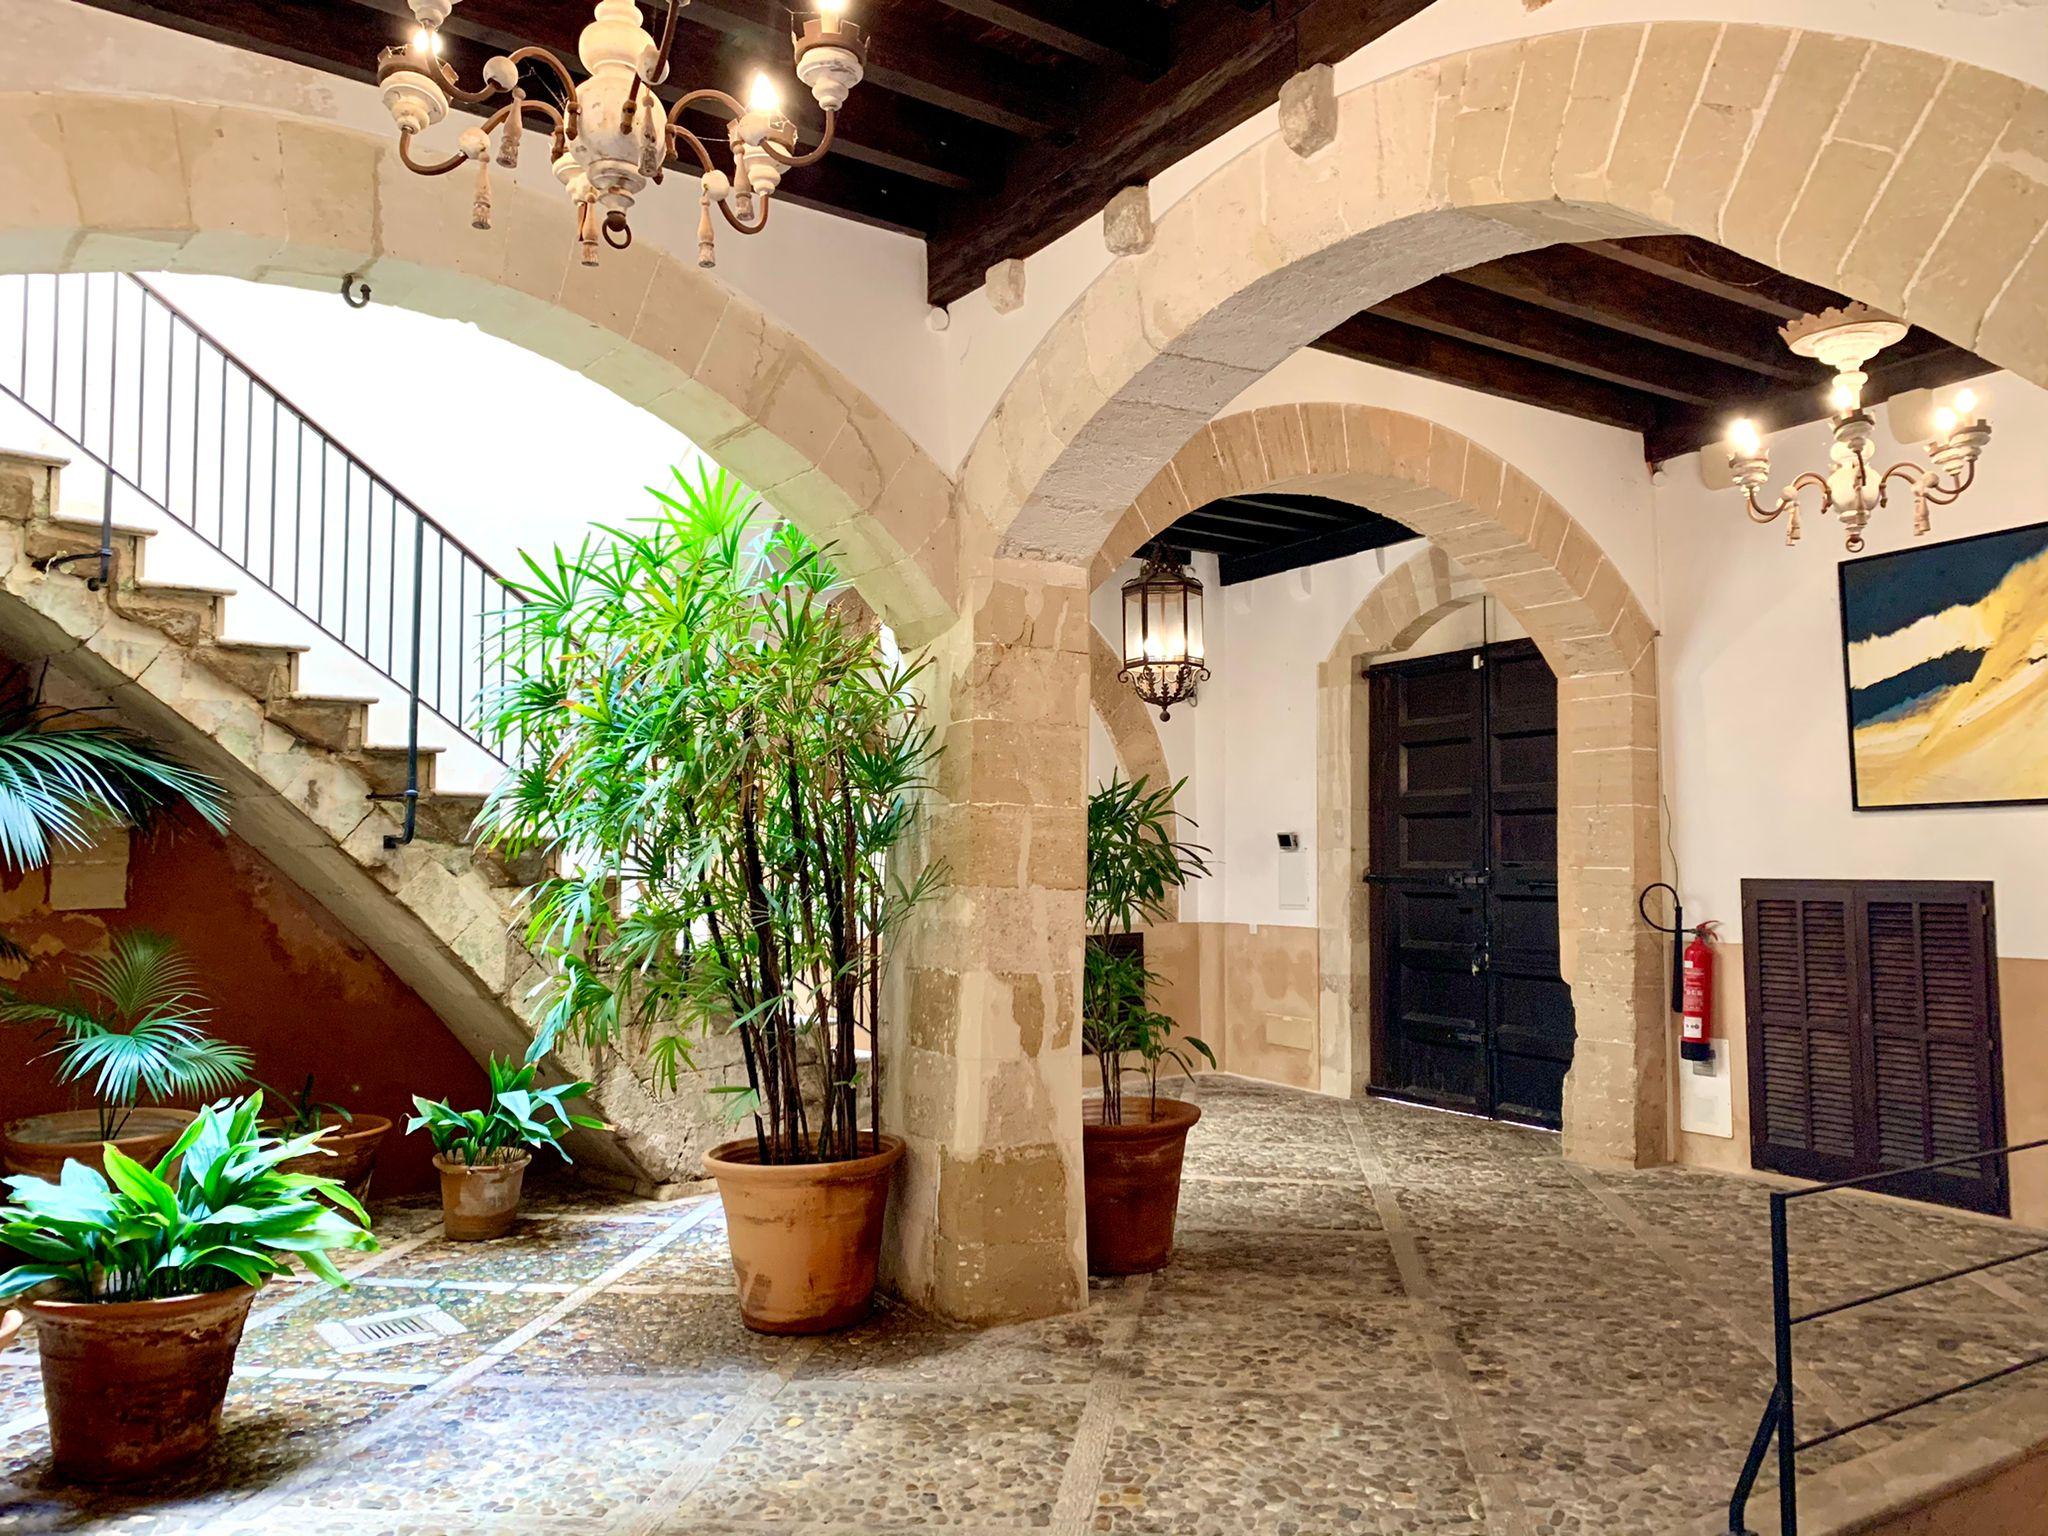 Palma: Immaculate Palatial townhouse